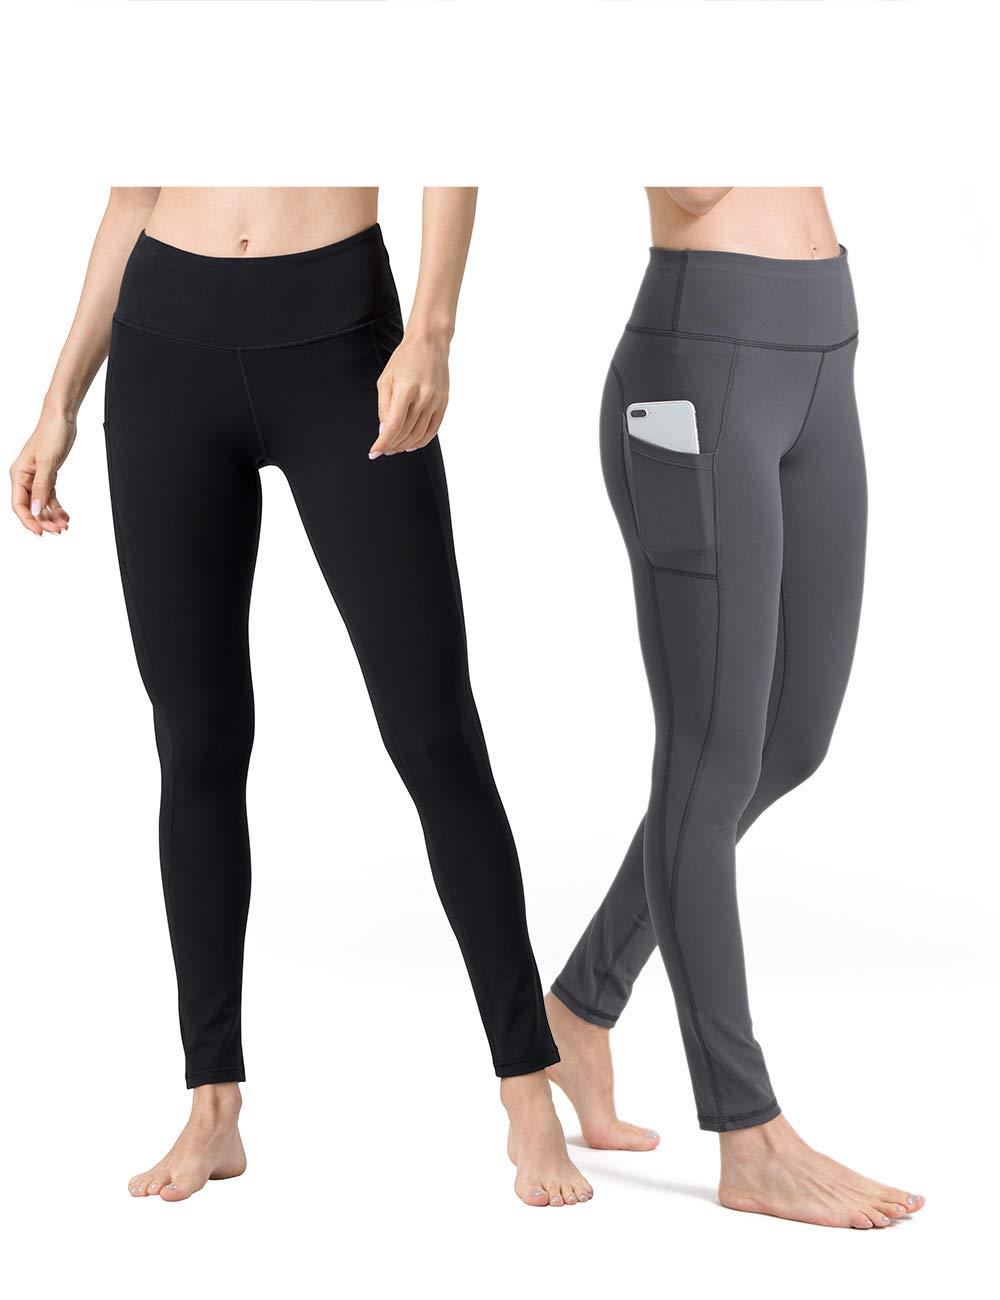 939527cf08 ALONG FIT Yoga Pants for Women mesh Leggings with Side Pockets High Waisted  Leggings